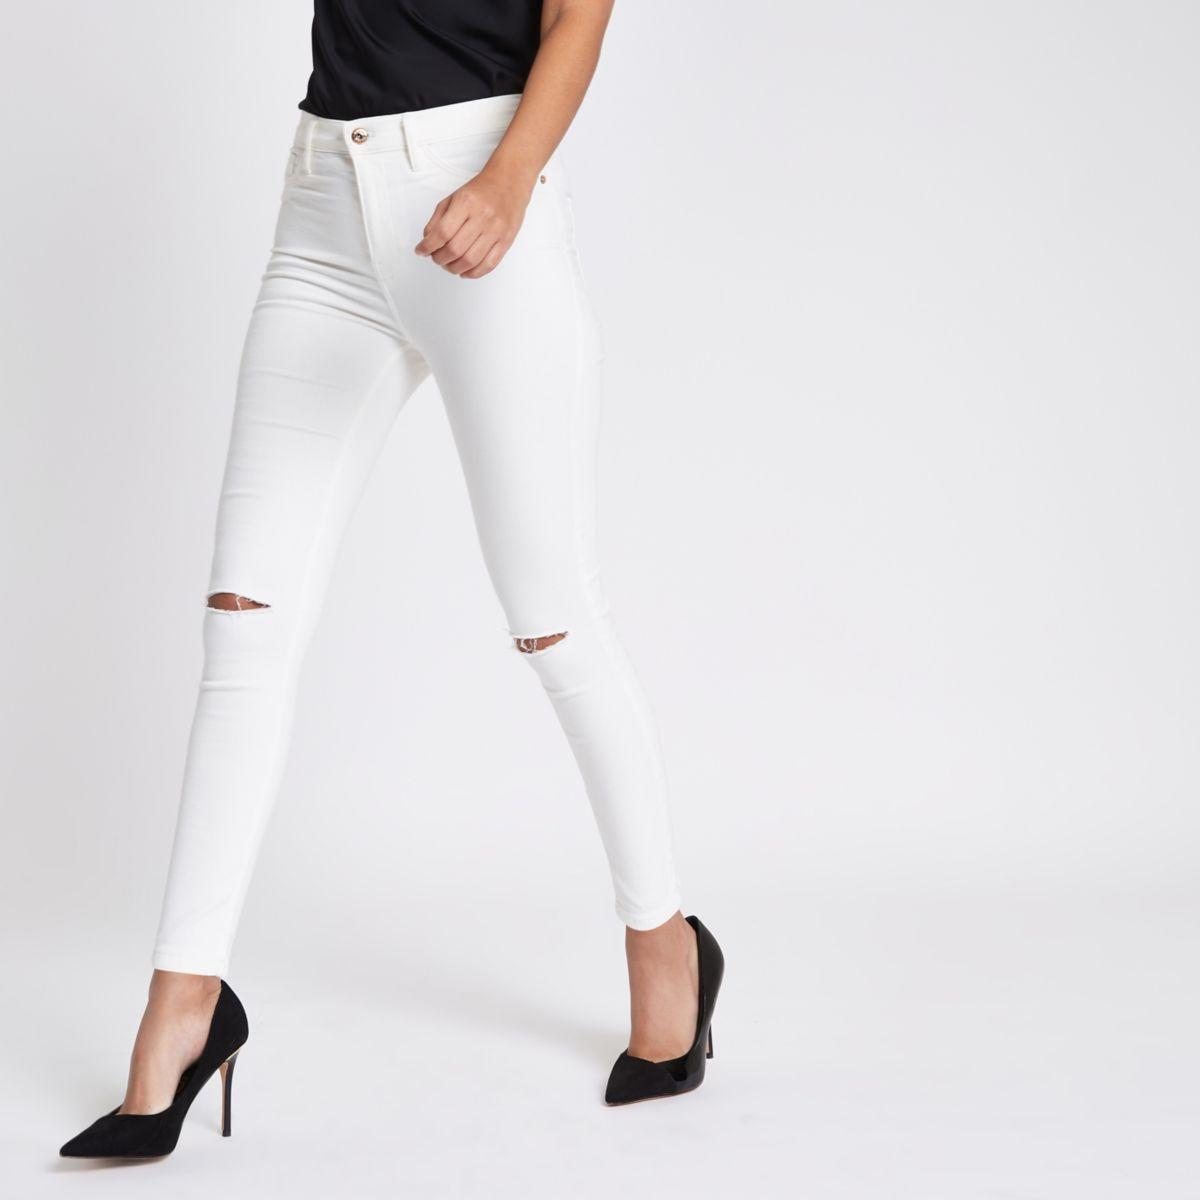 White Harper high rise super skinny jeans